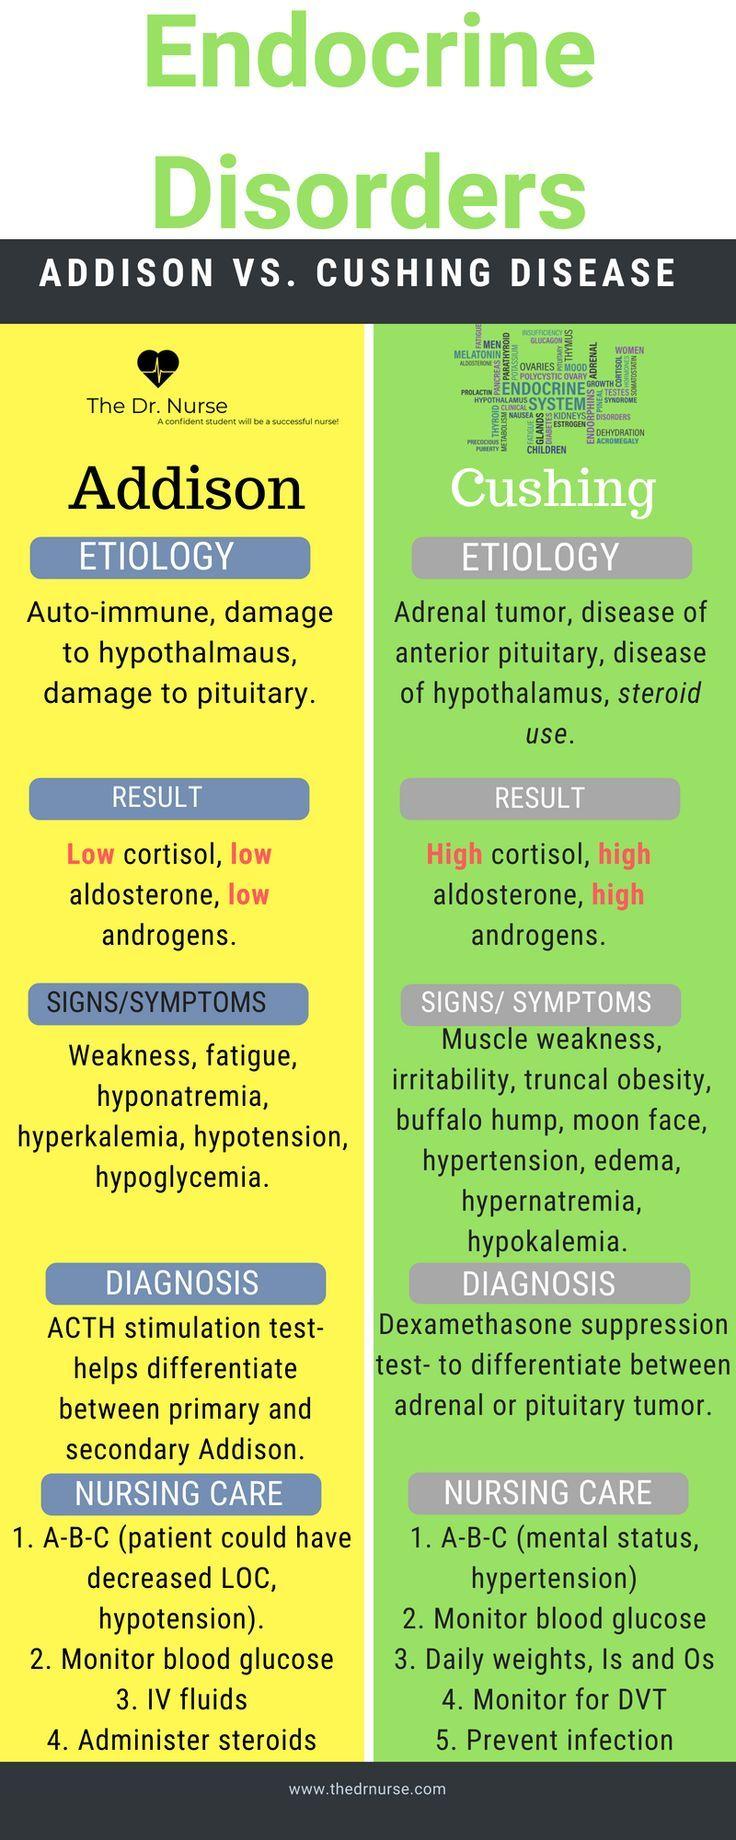 Simple comparison of Addison vs. Cushing disease. More